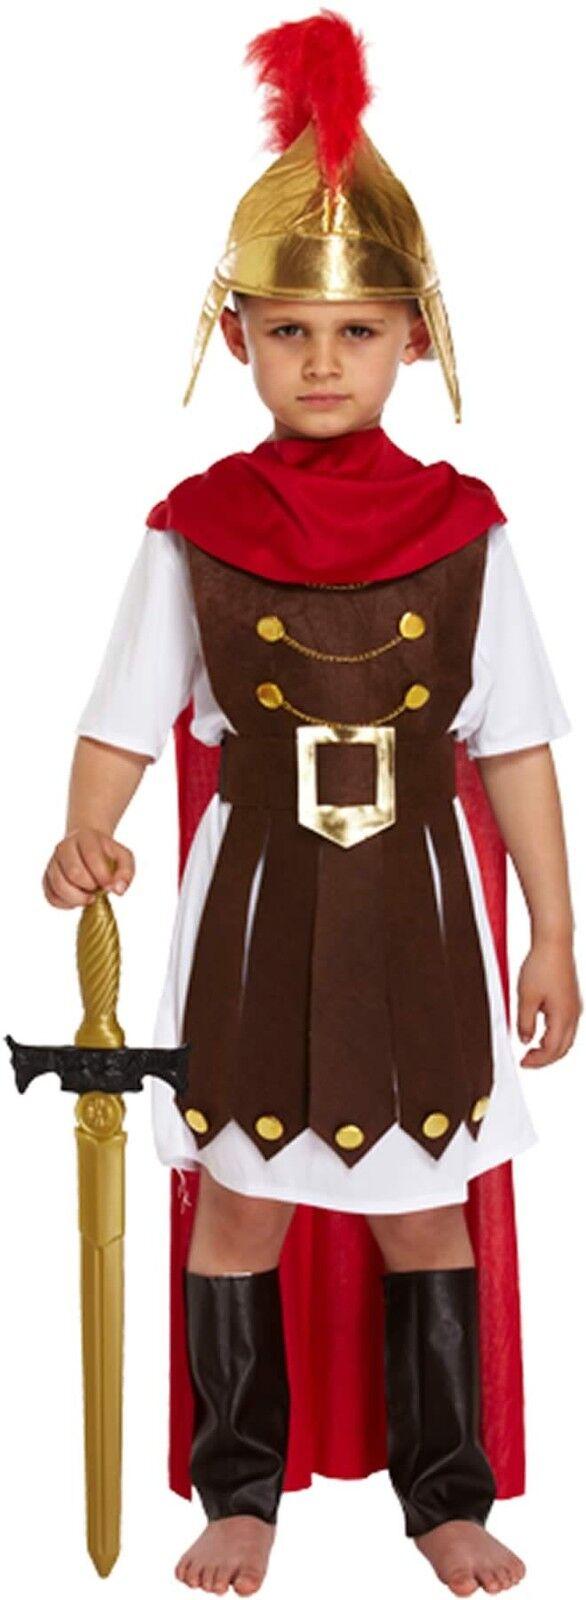 Boys Roman General Childs Fancy Dress Costume Outfit Histori